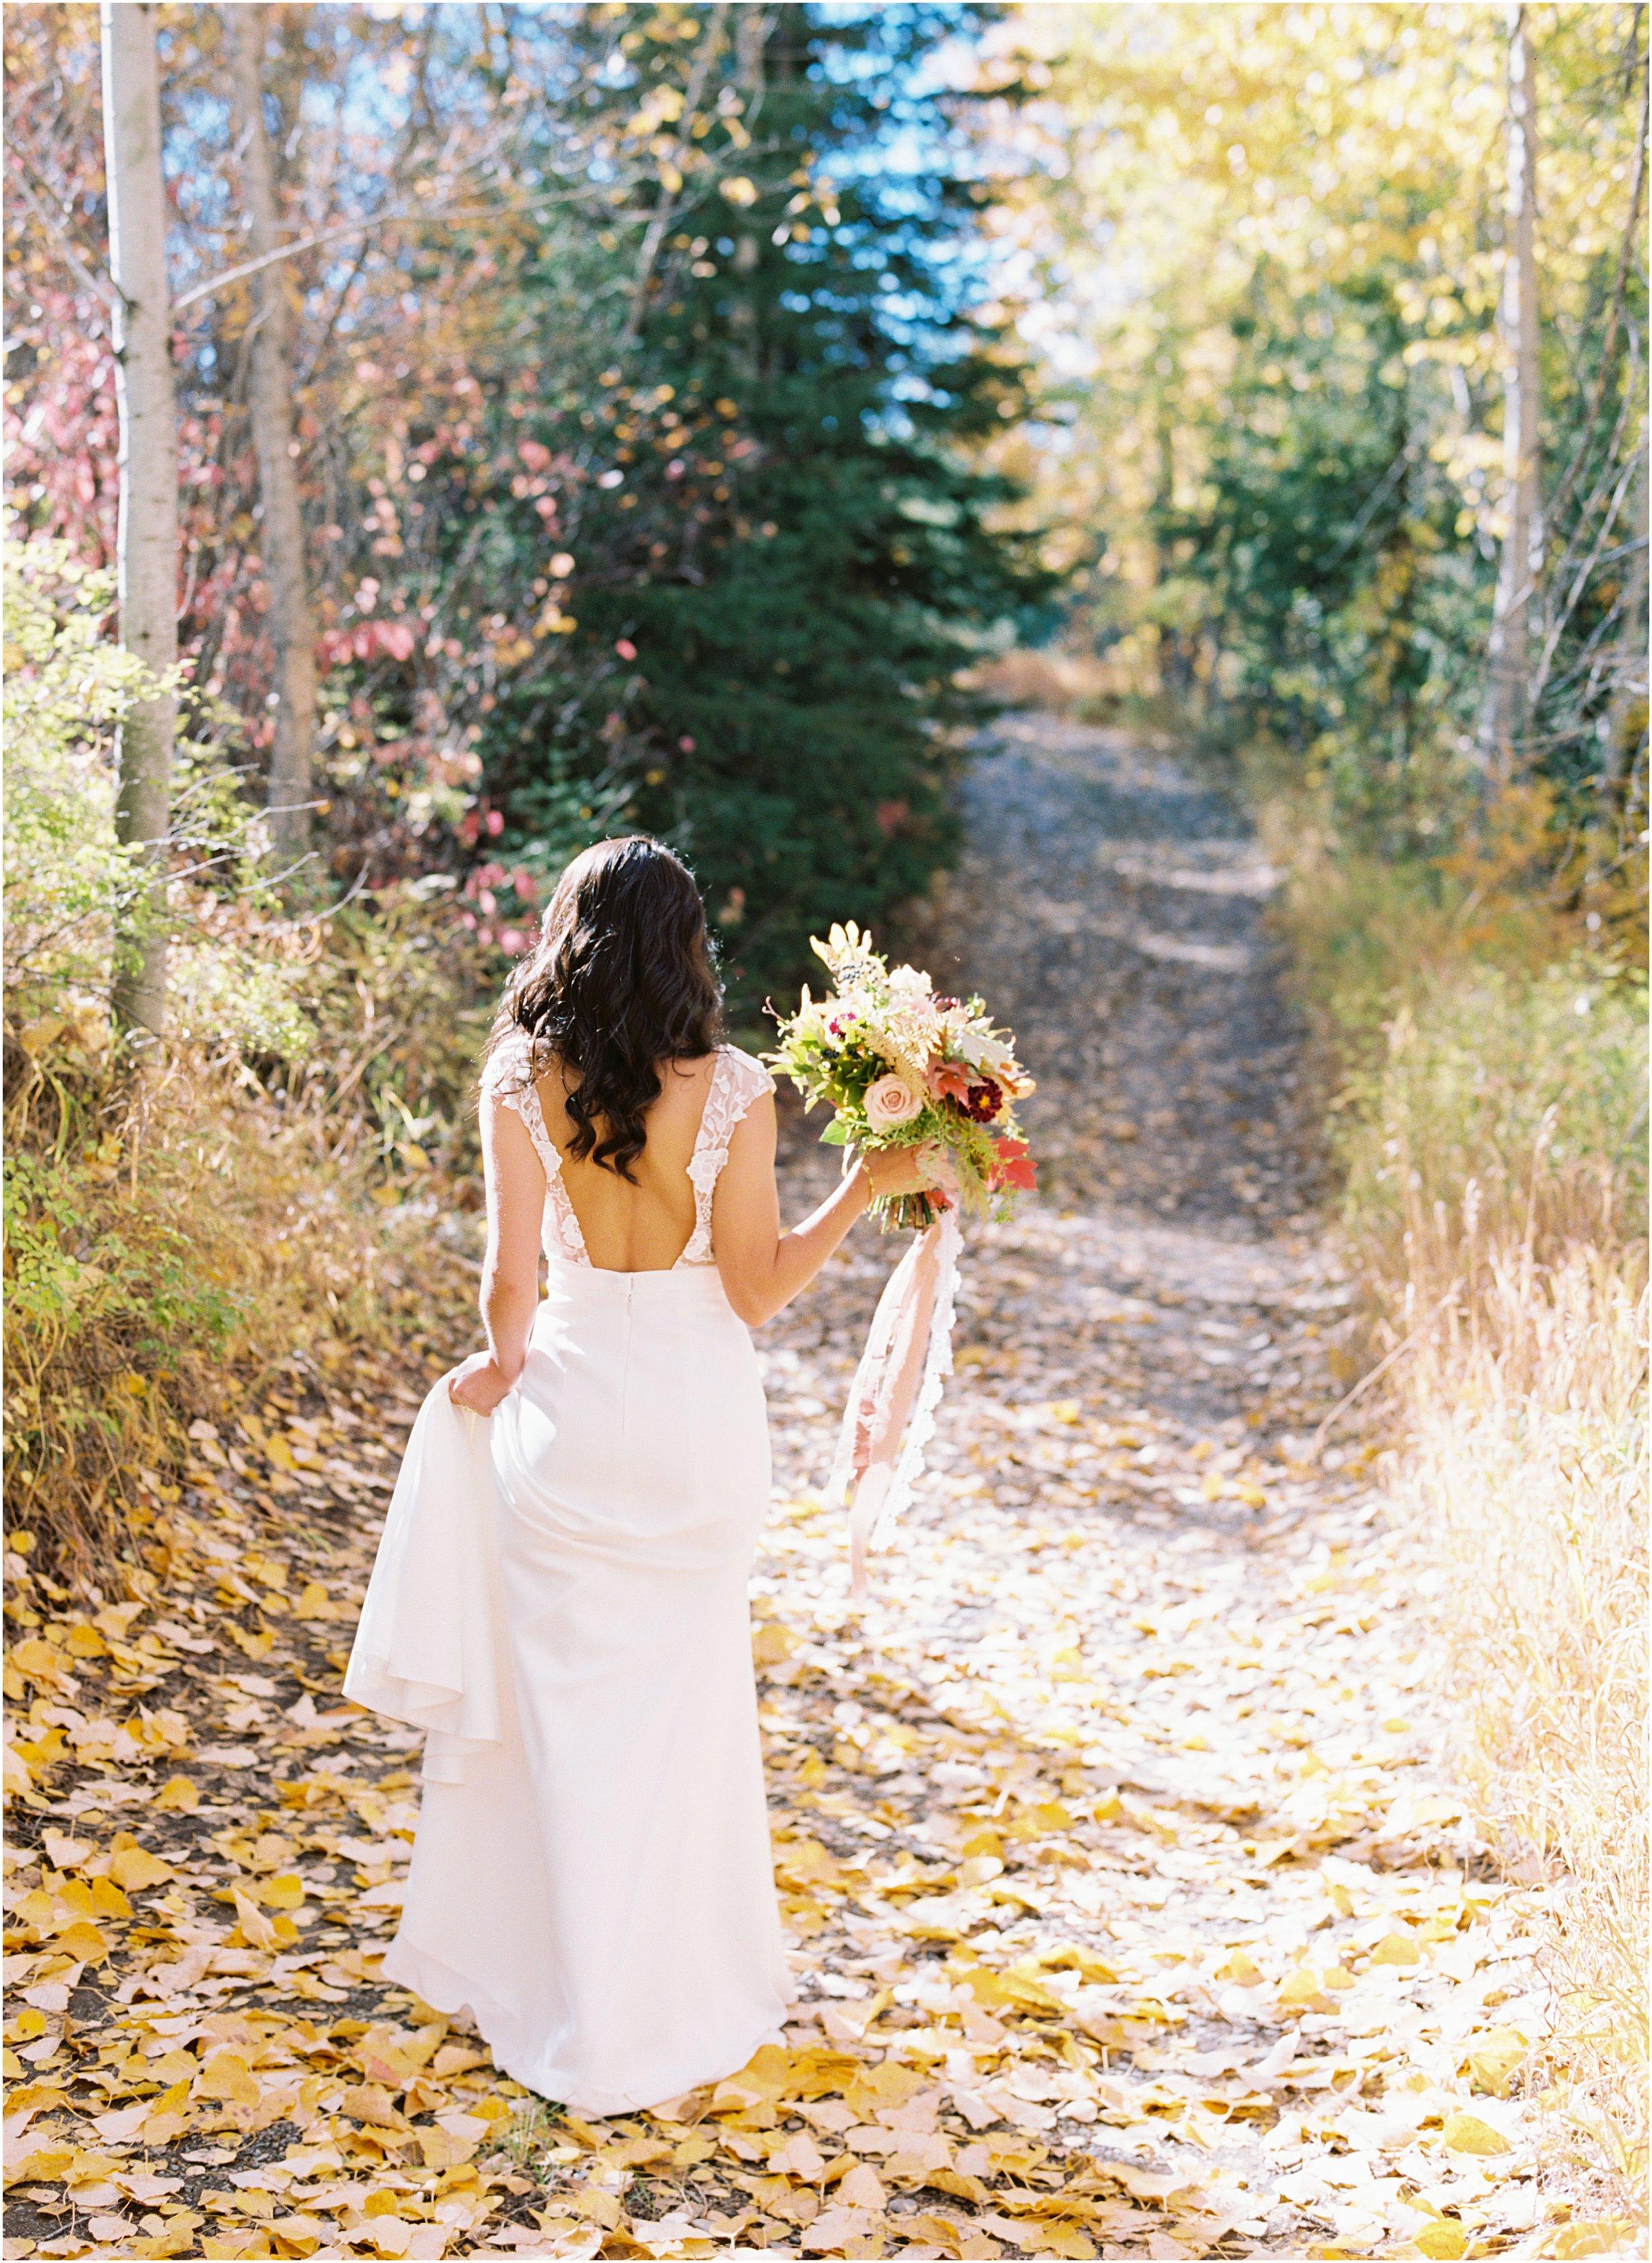 ©Jeremiah & Rachel Photographywww.jeremiahandrachel.com